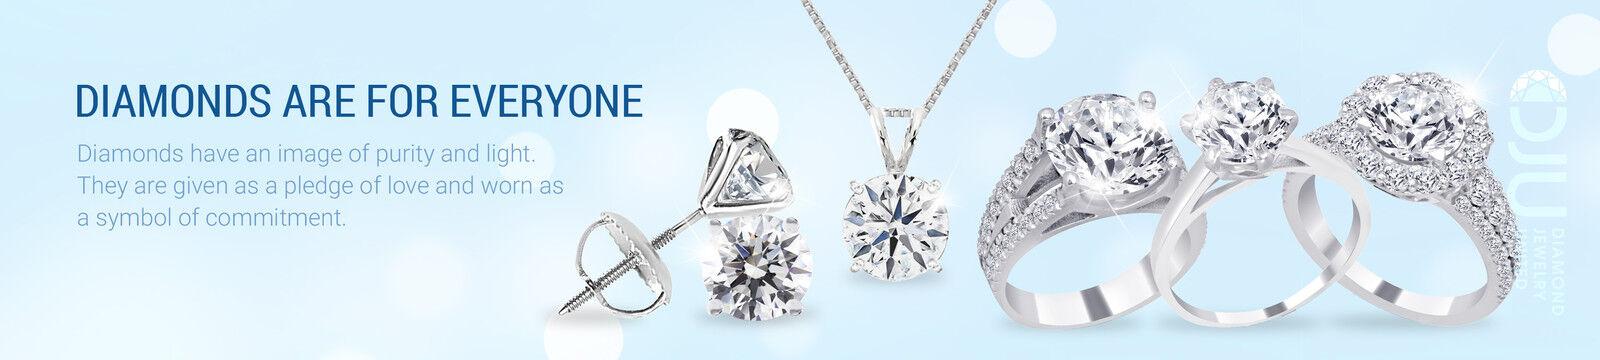 Items in Diamond Jewelry United store on eBay